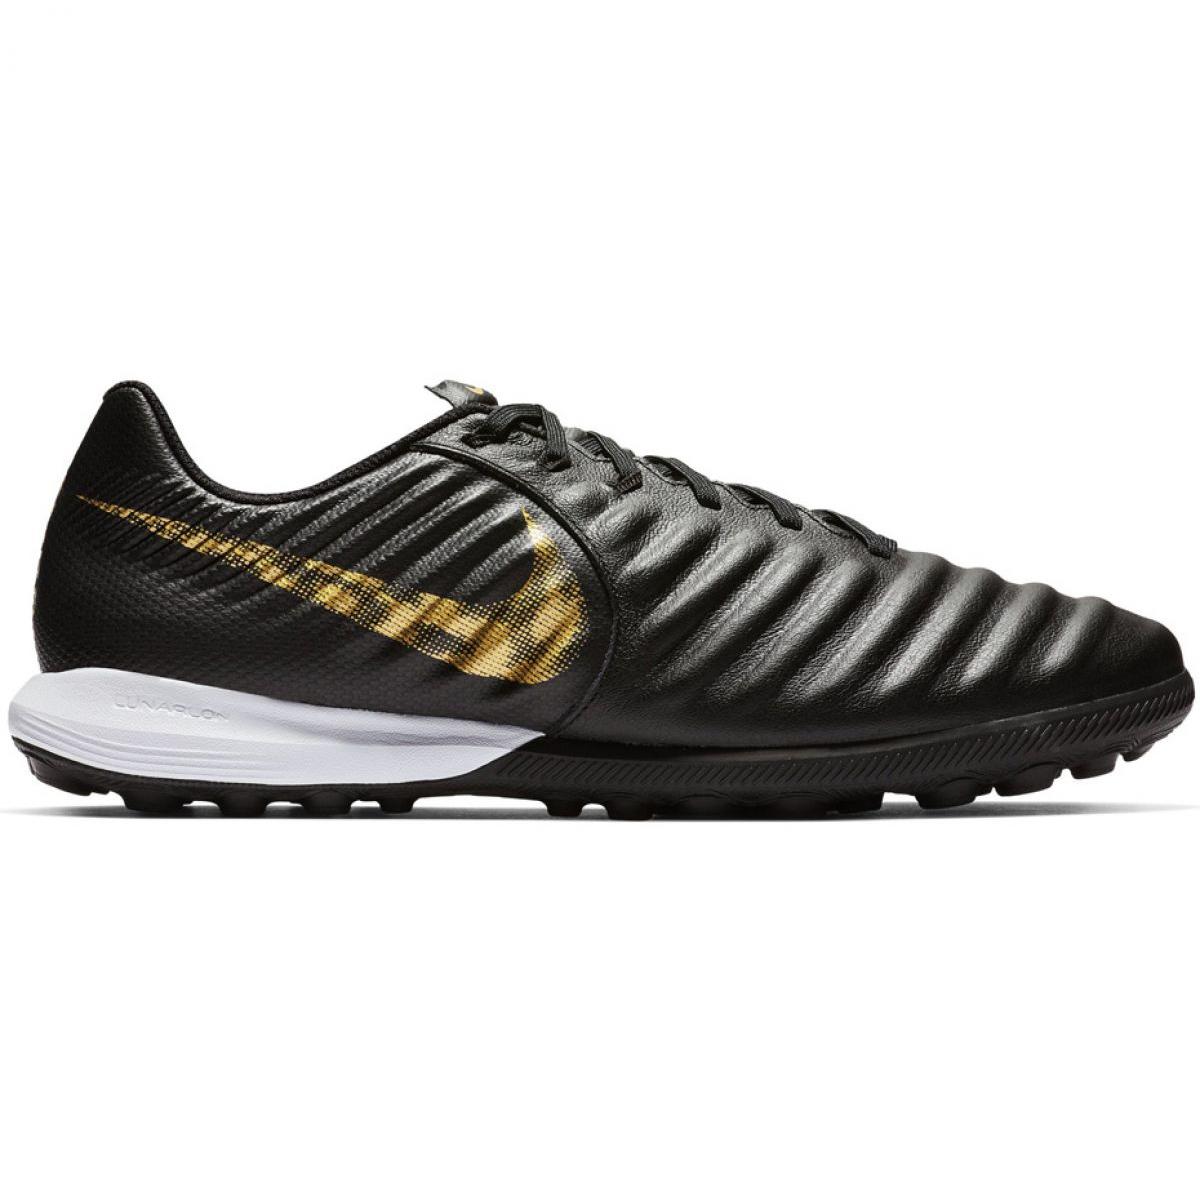 Football Chaussures Nike cravatempo Lunar Legend x7 Pro TF M ah7249-077